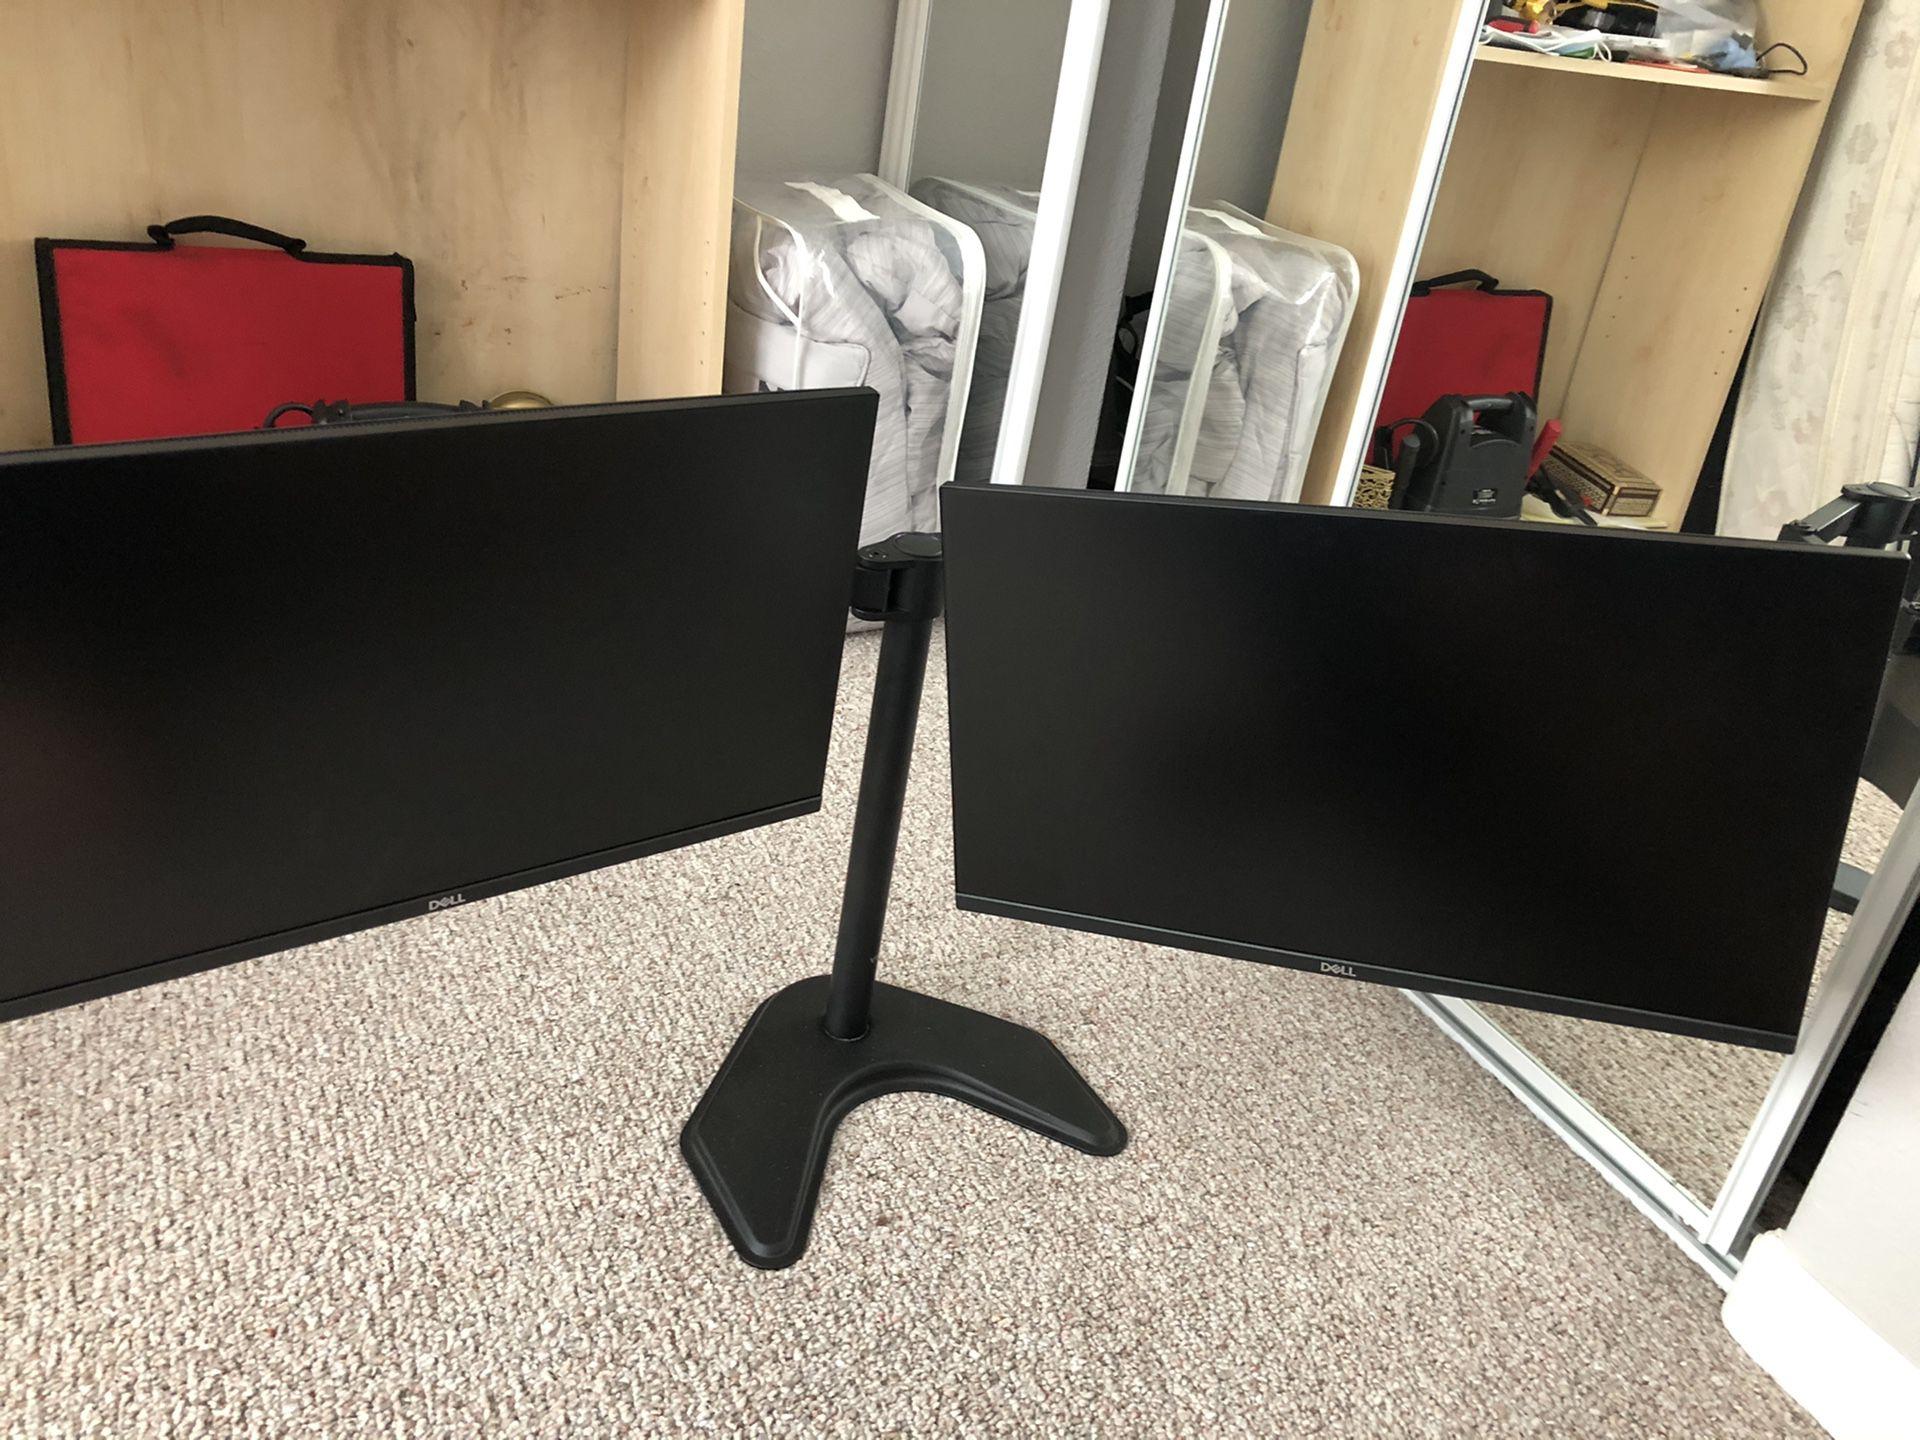 Dell UltraSharp 24 Monitor - U2415 Dual Monitor Setup